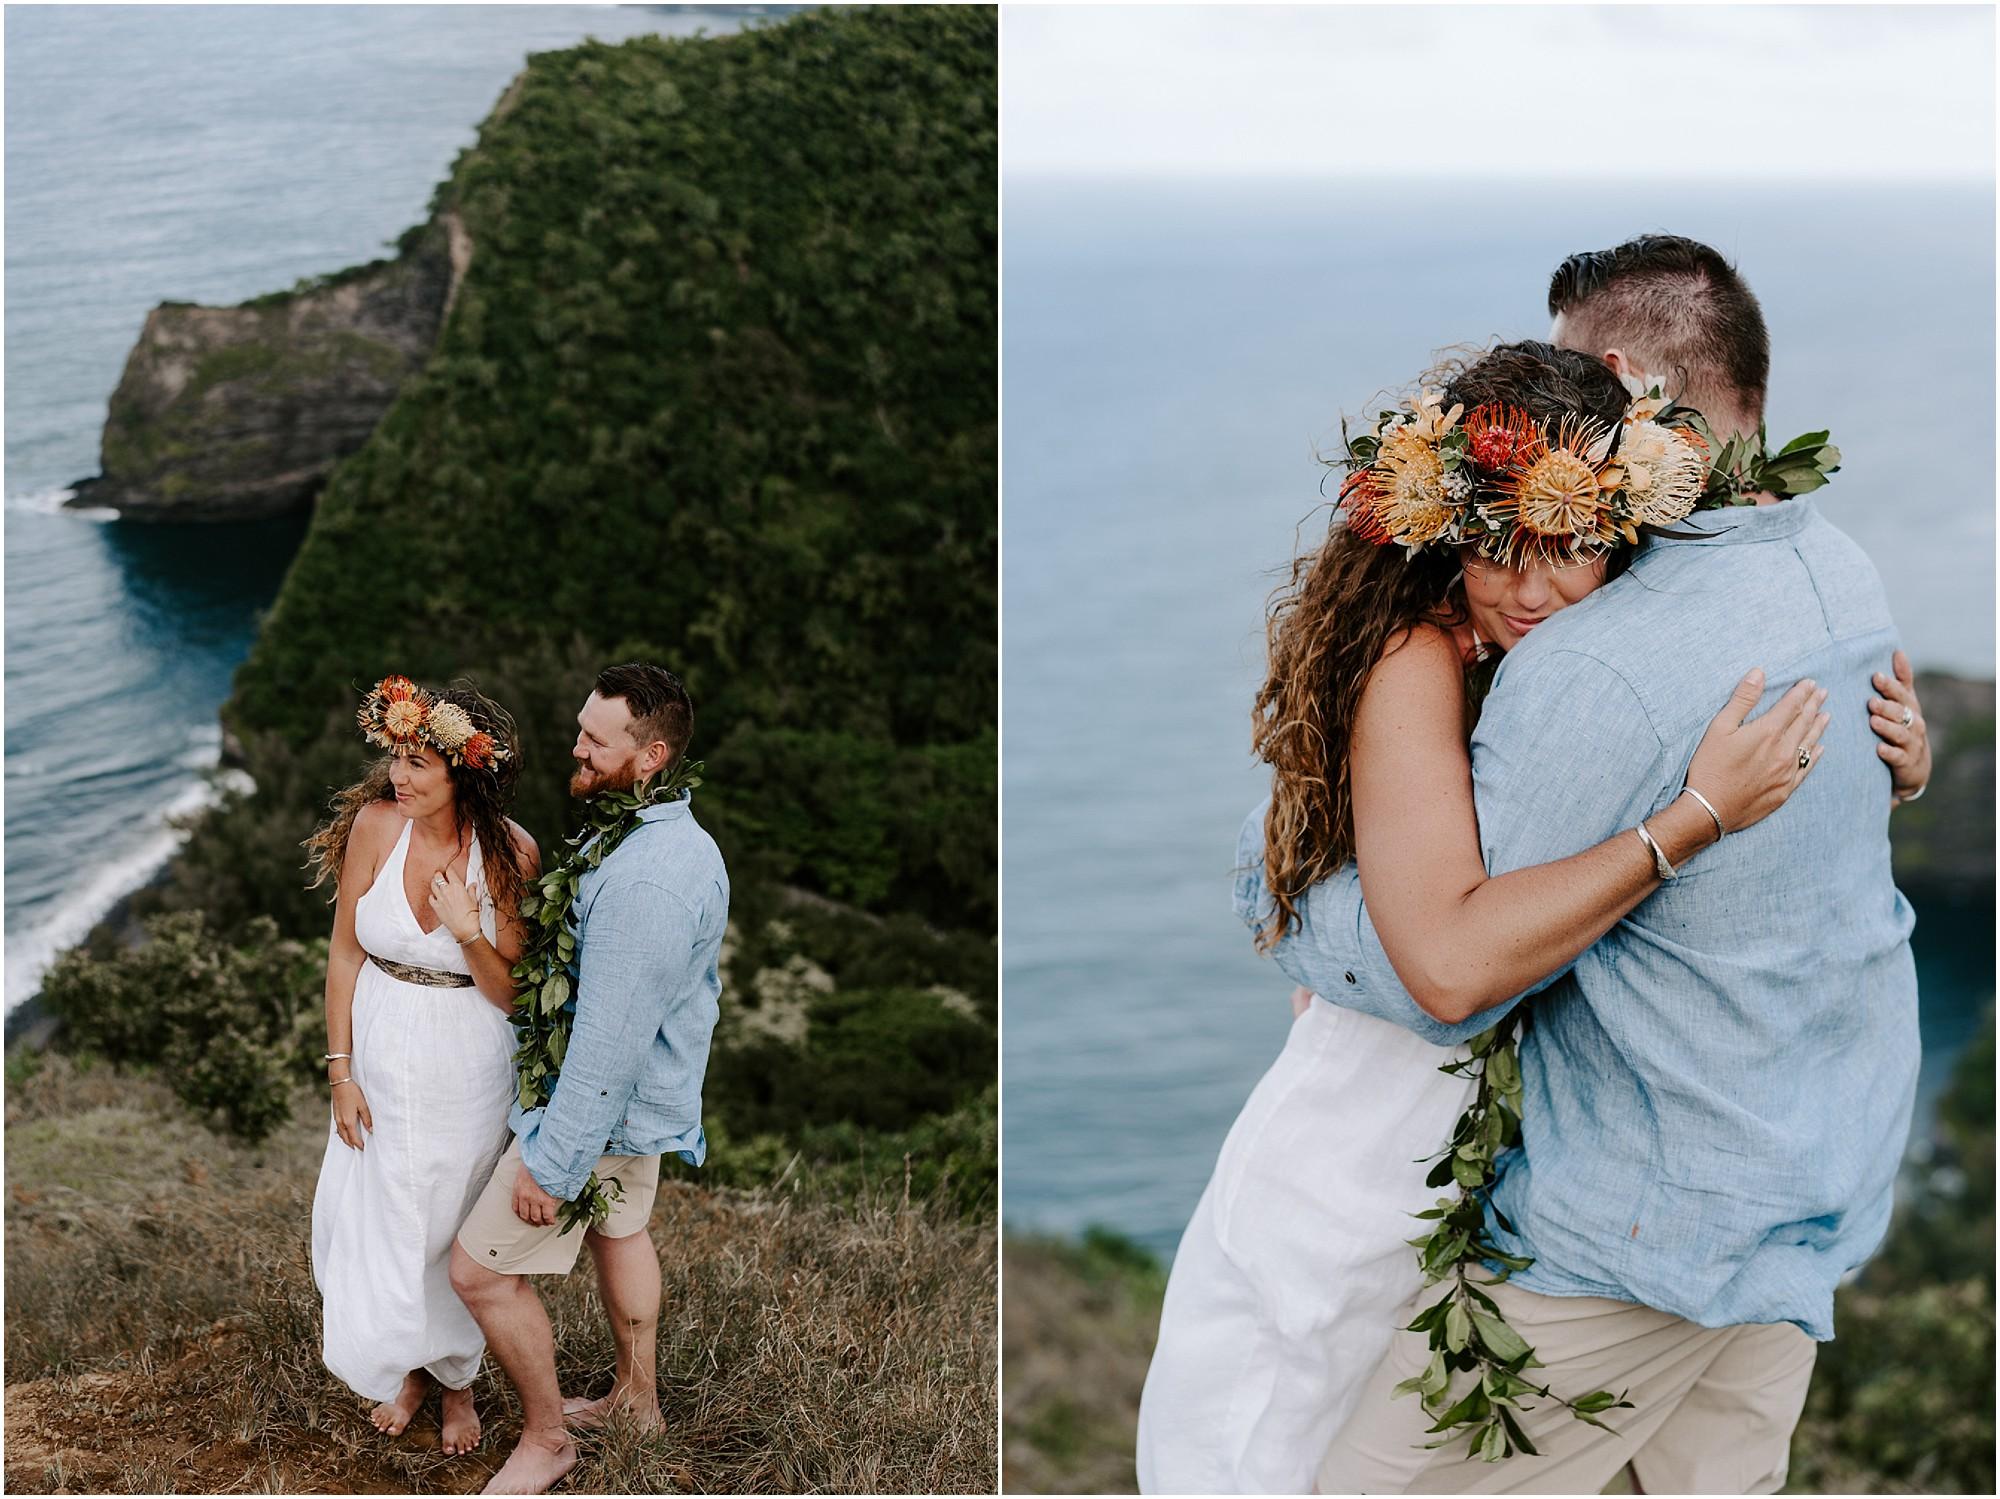 big-island-valley-proposal-hawaii-elopement-photographer_0012.jpg